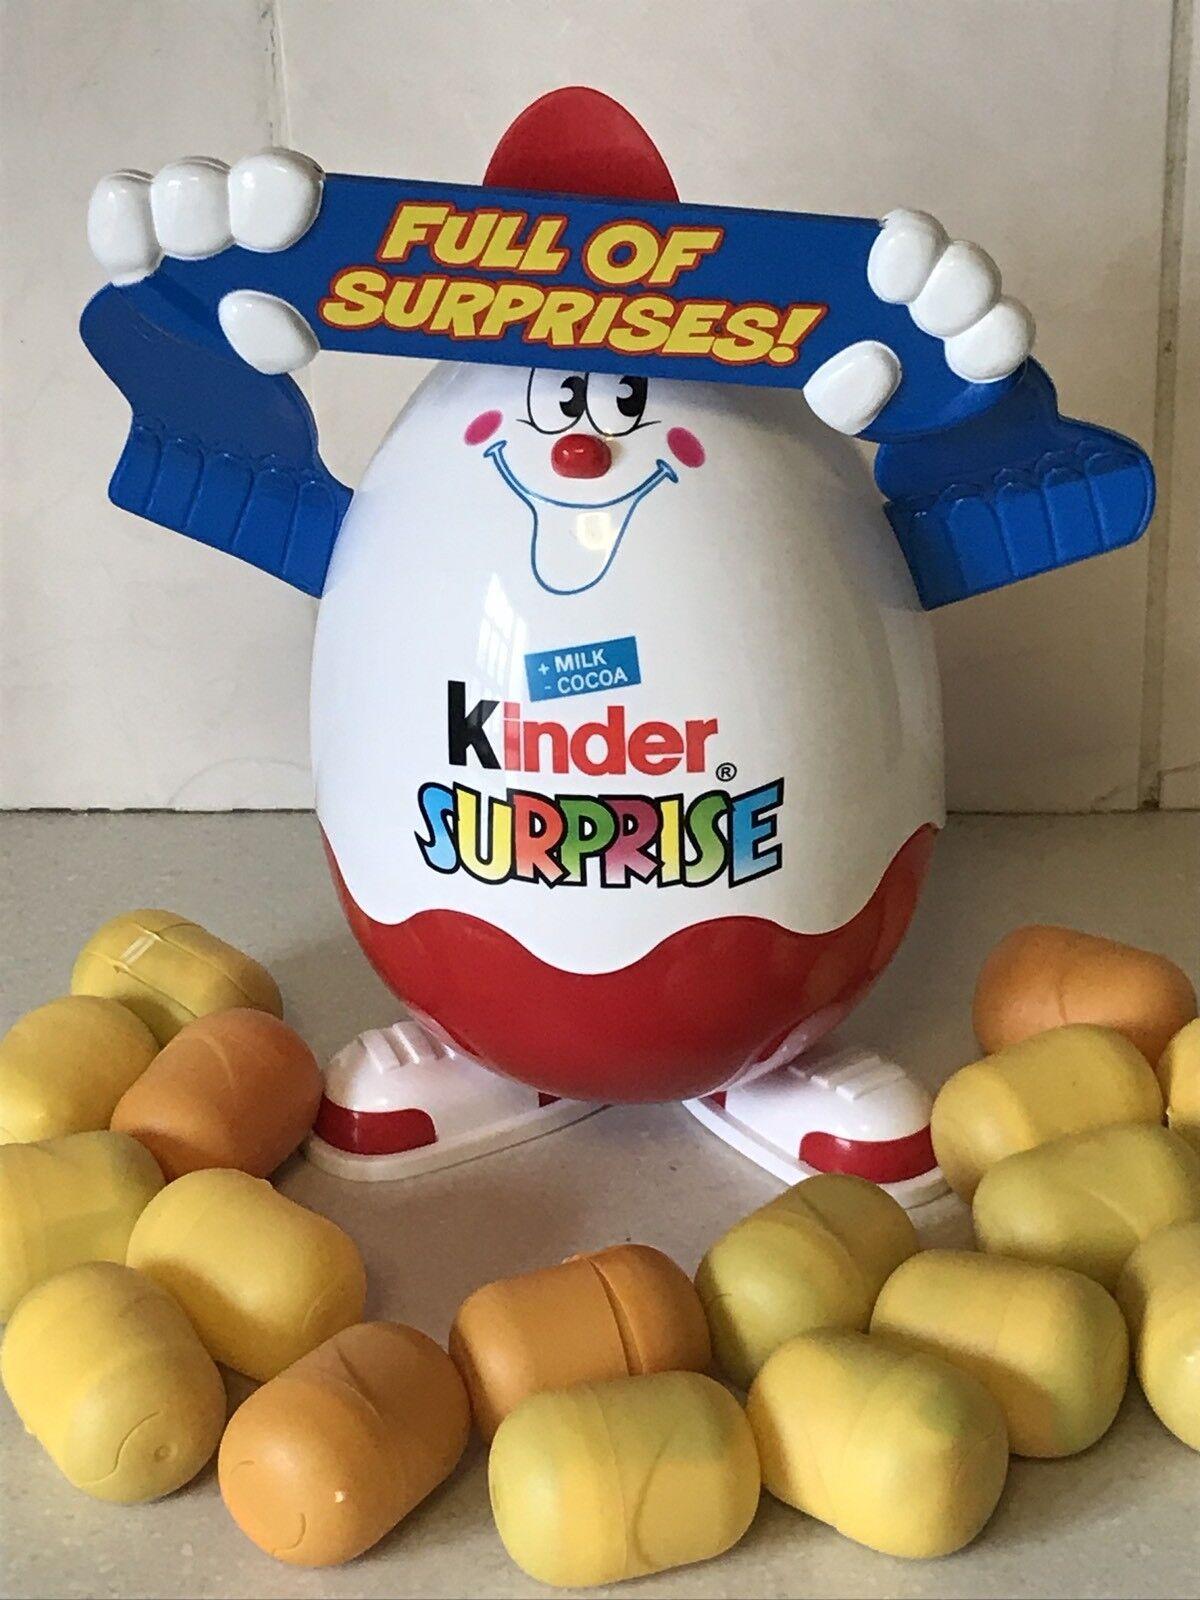 Kinder Egg Surprise Mega Rare Capsule Toy Display Counter Holder & 26 Full